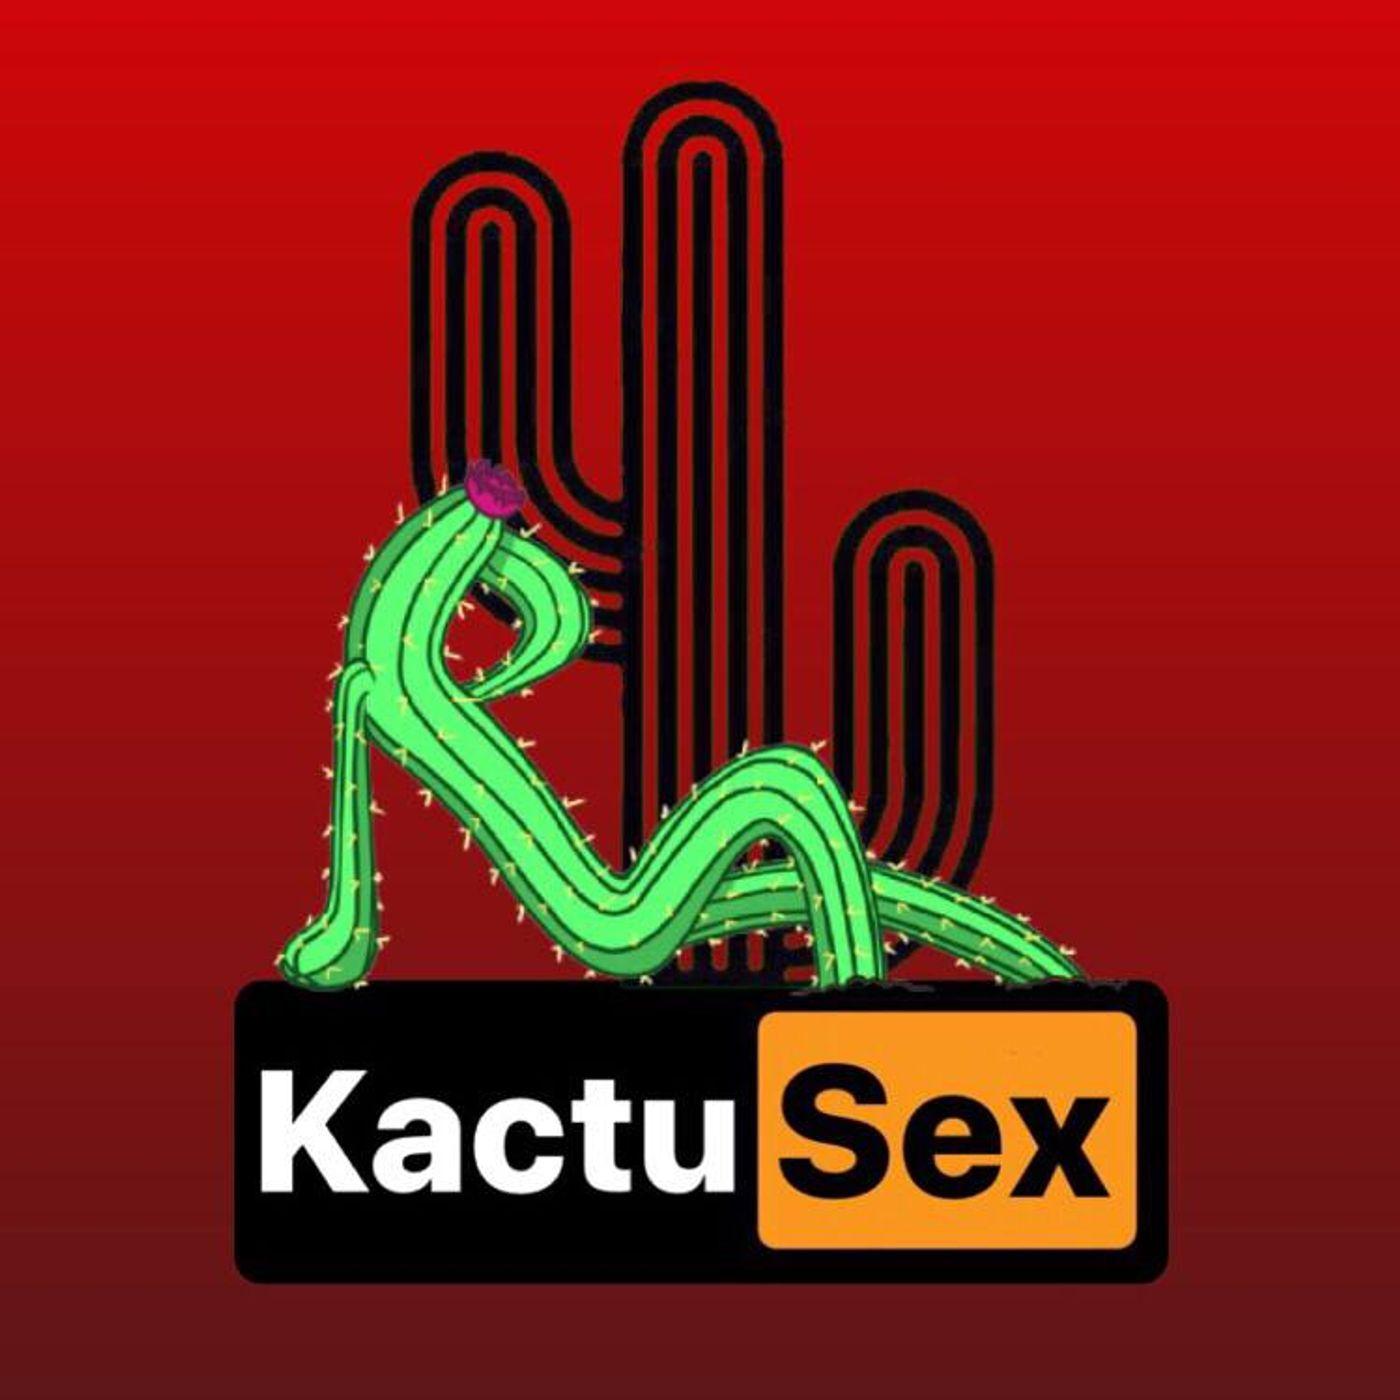 Mandare il Kactus in Chat (feat. Valeria Montebello) - Episodio 03 - KactuSex - Podcast del Kactus